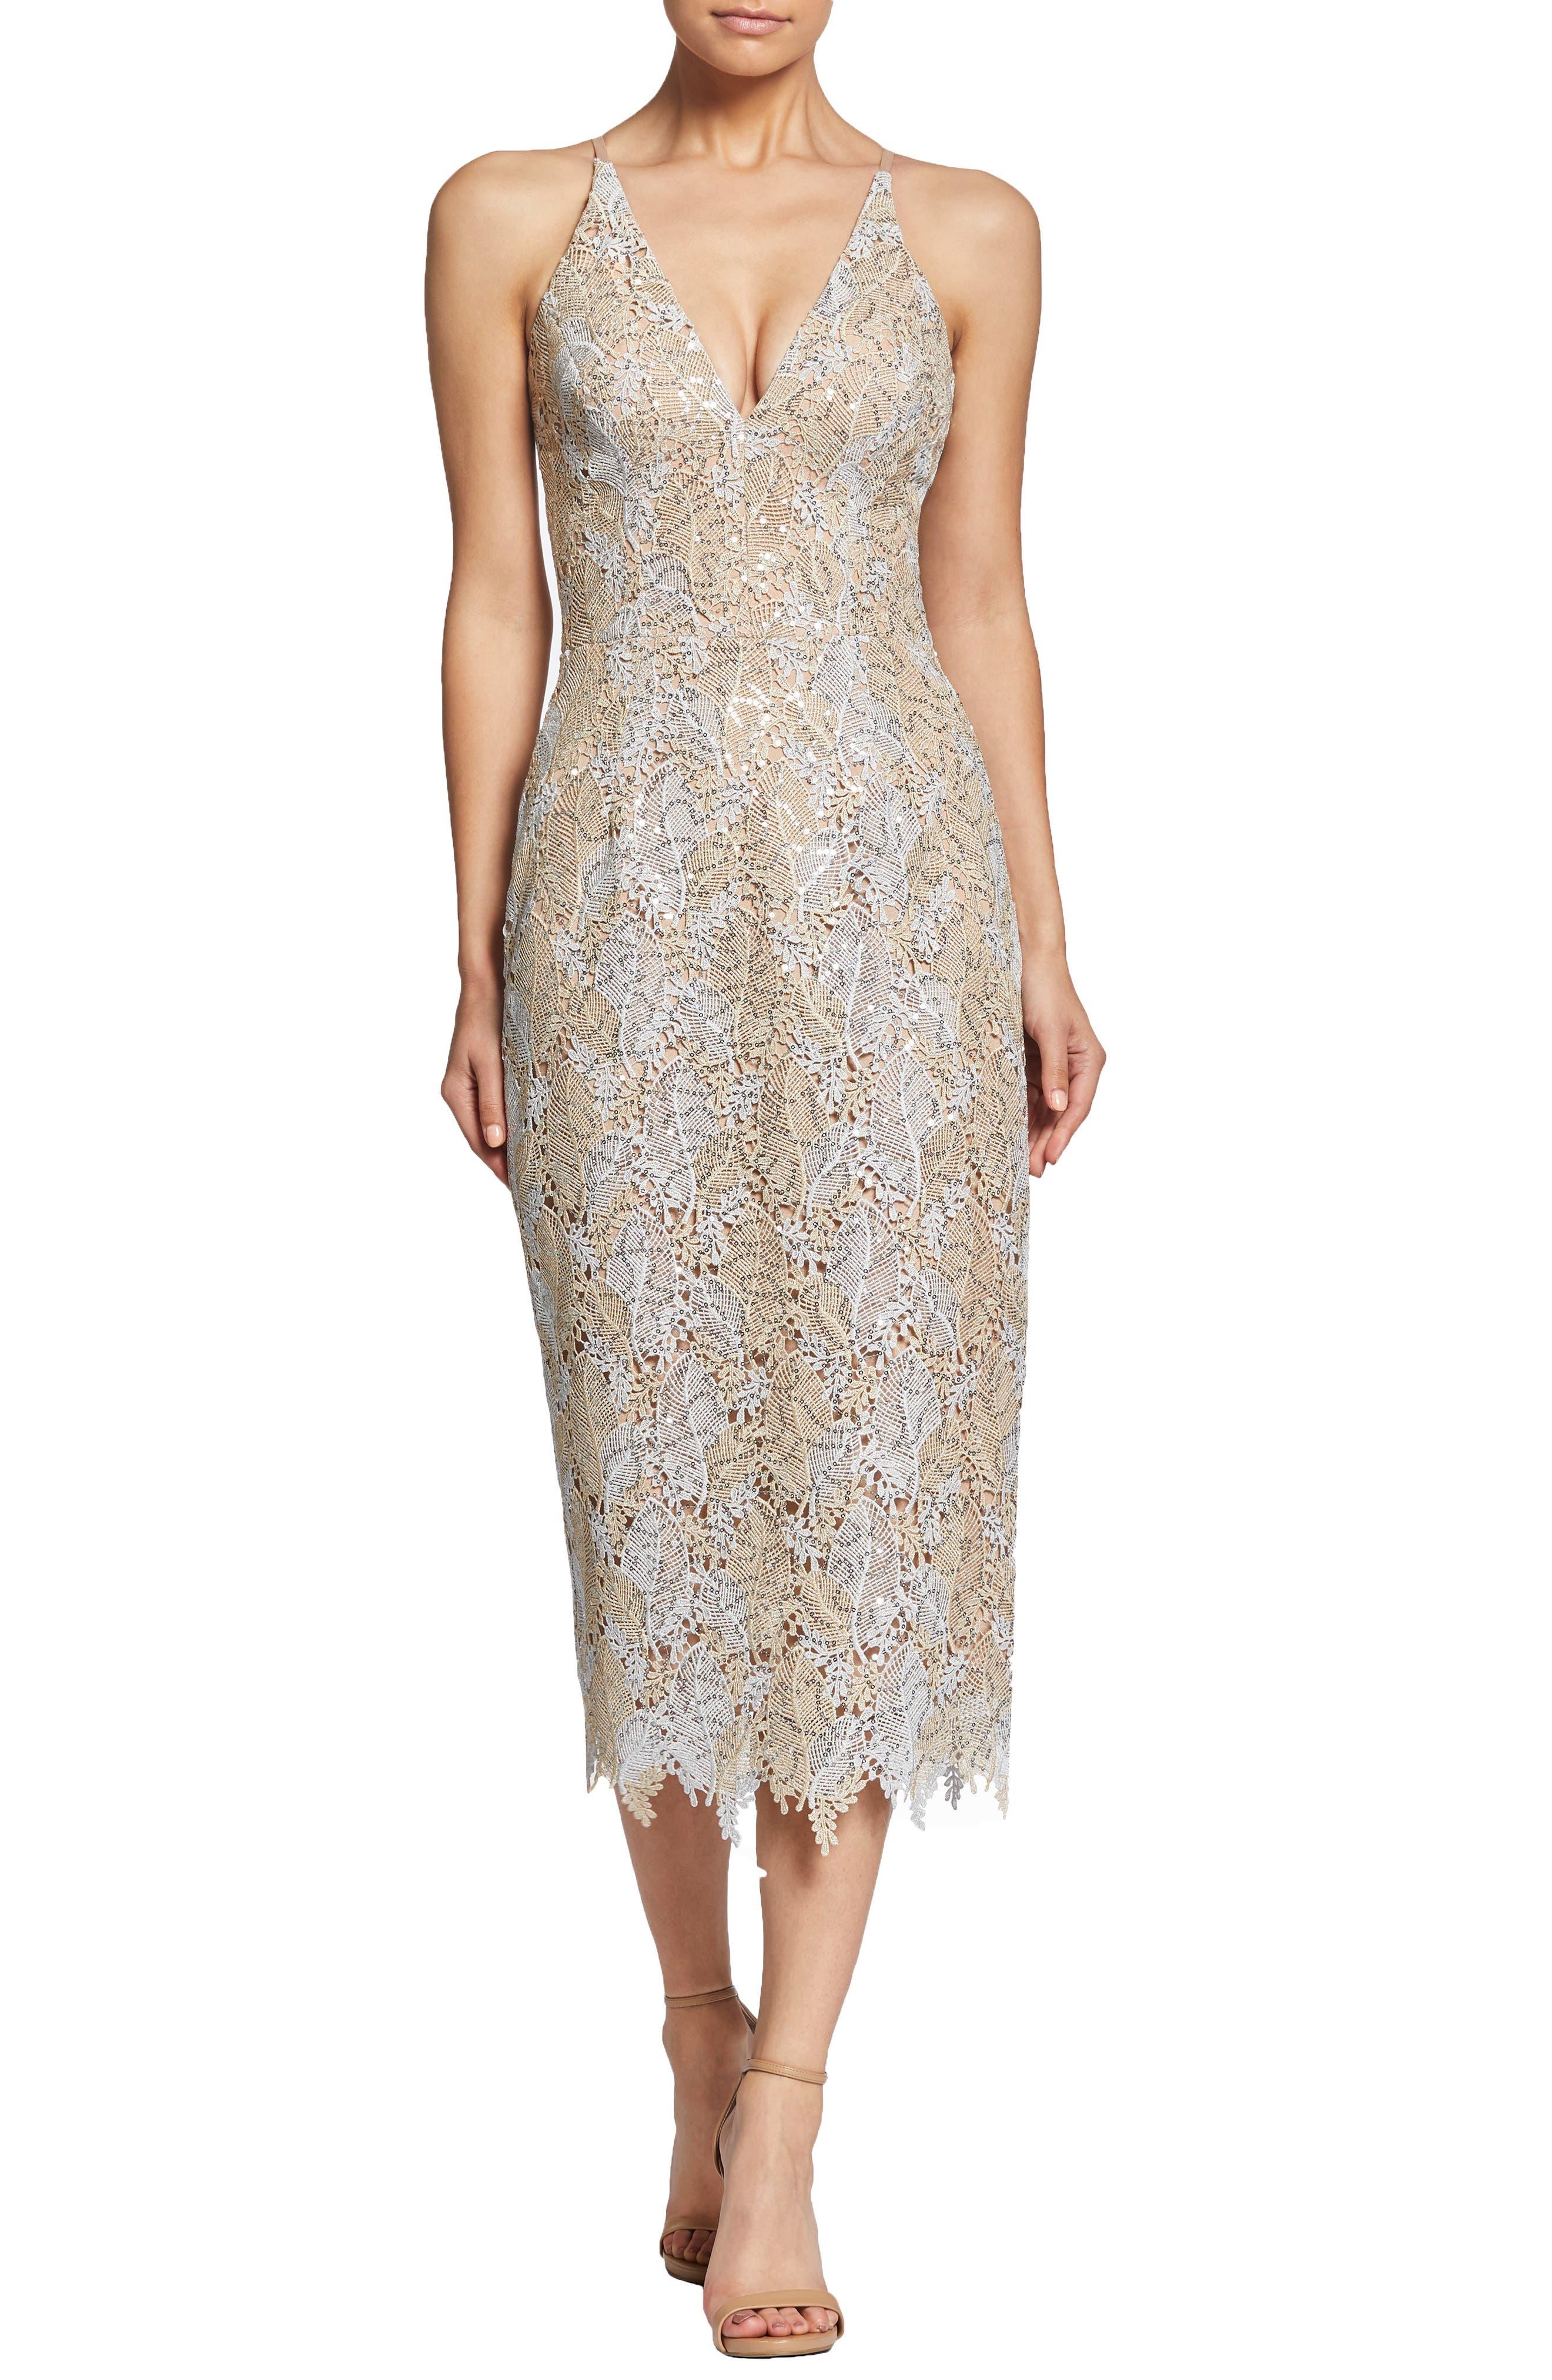 Aurora Lace Sheath Dress,                             Main thumbnail 1, color,                             PLATINUM/ GOLD